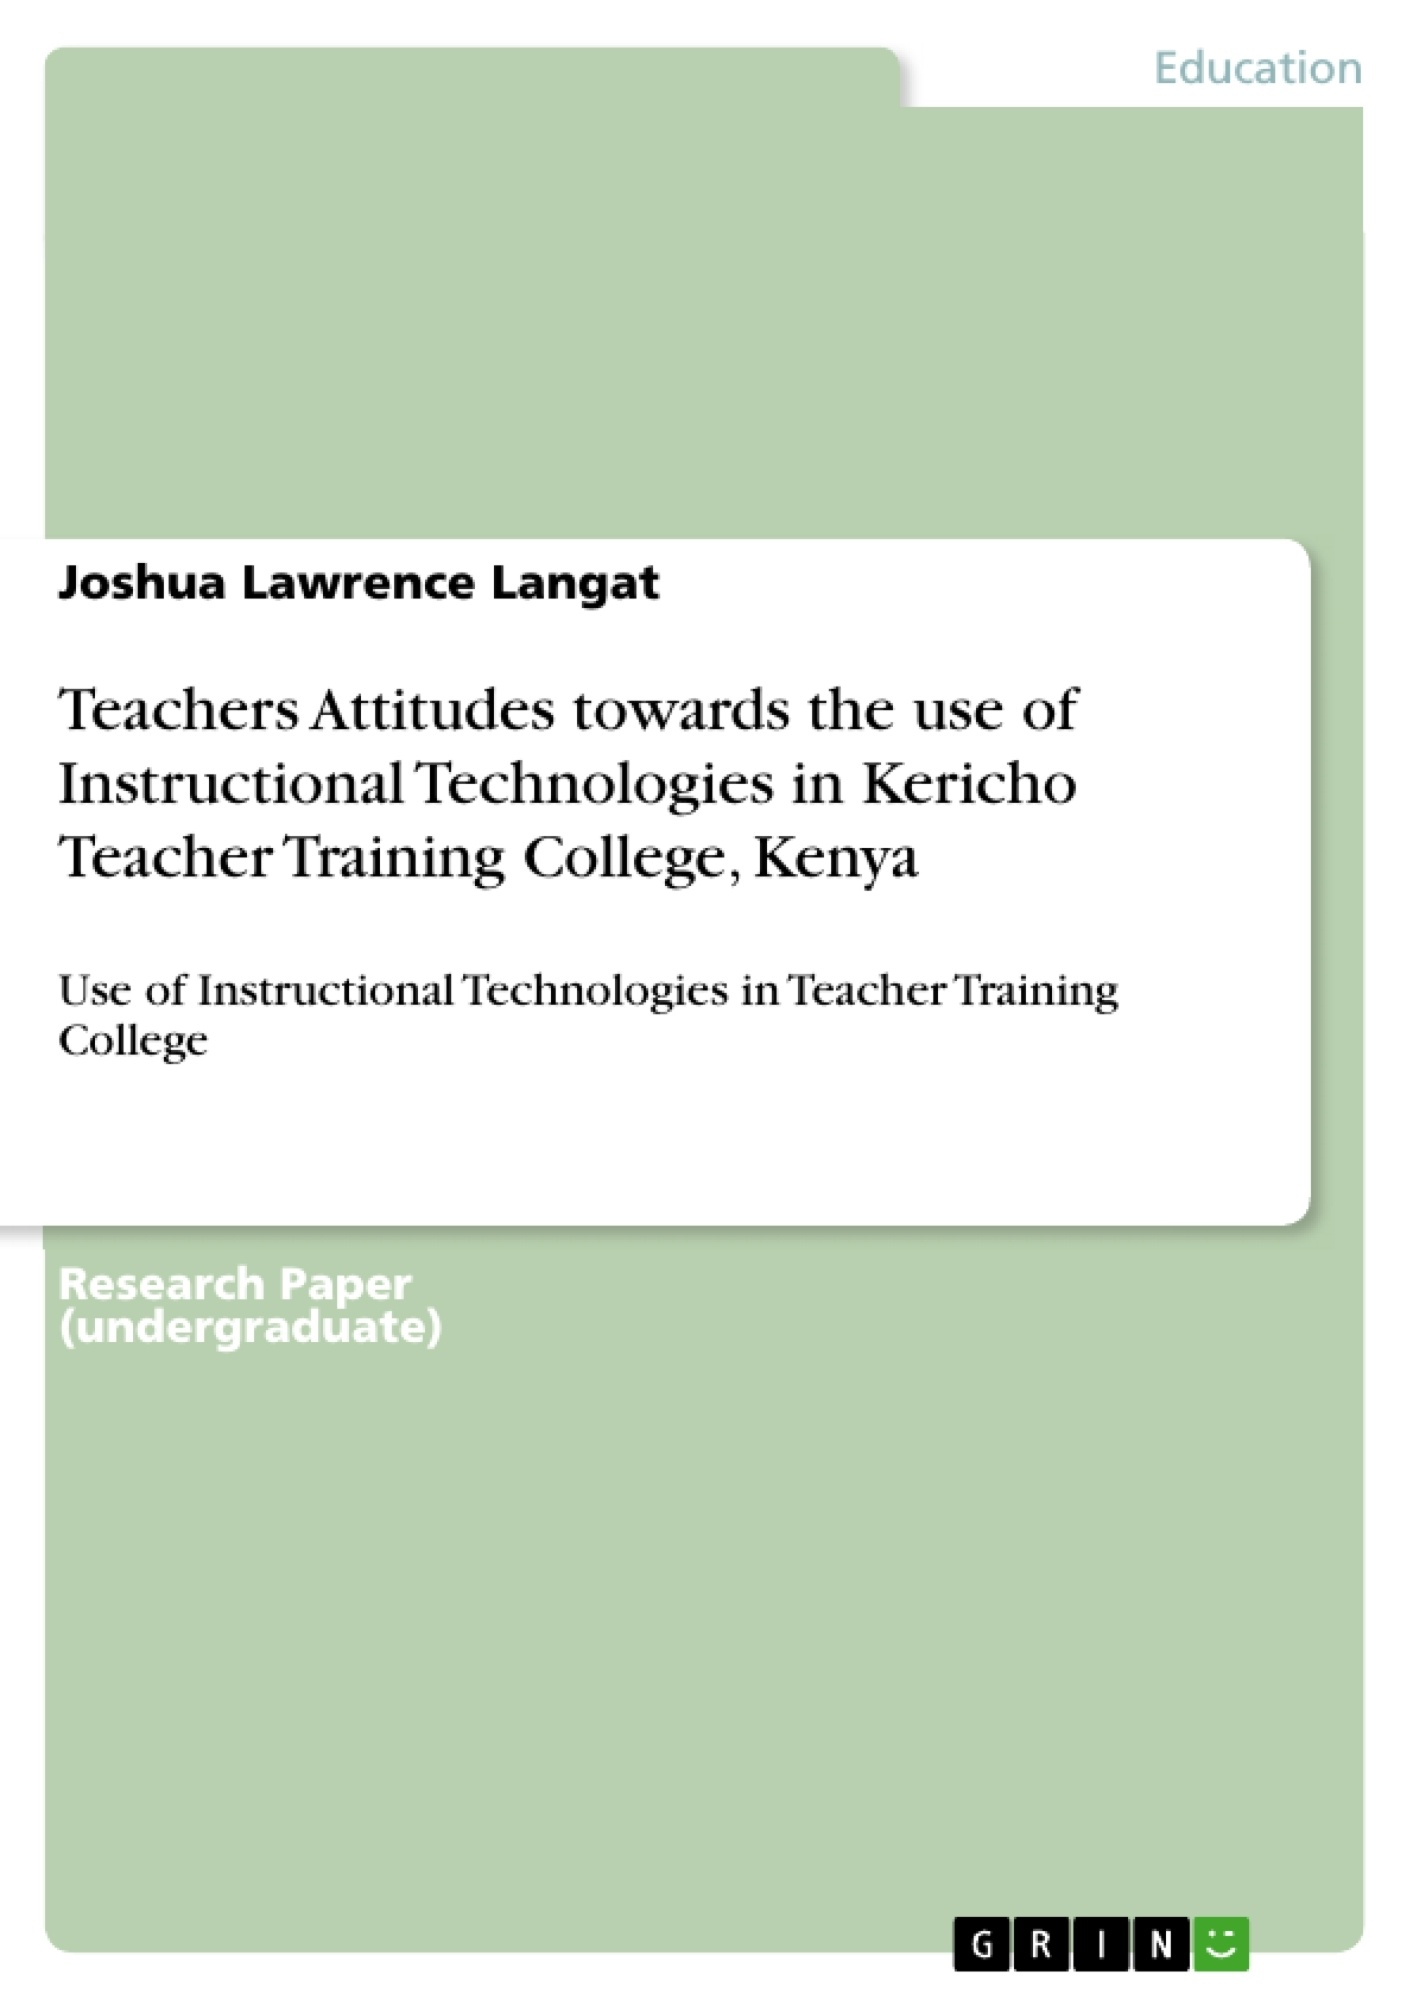 Title: Teachers Attitudes towards the use of Instructional Technologies in Kericho Teacher Training College, Kenya